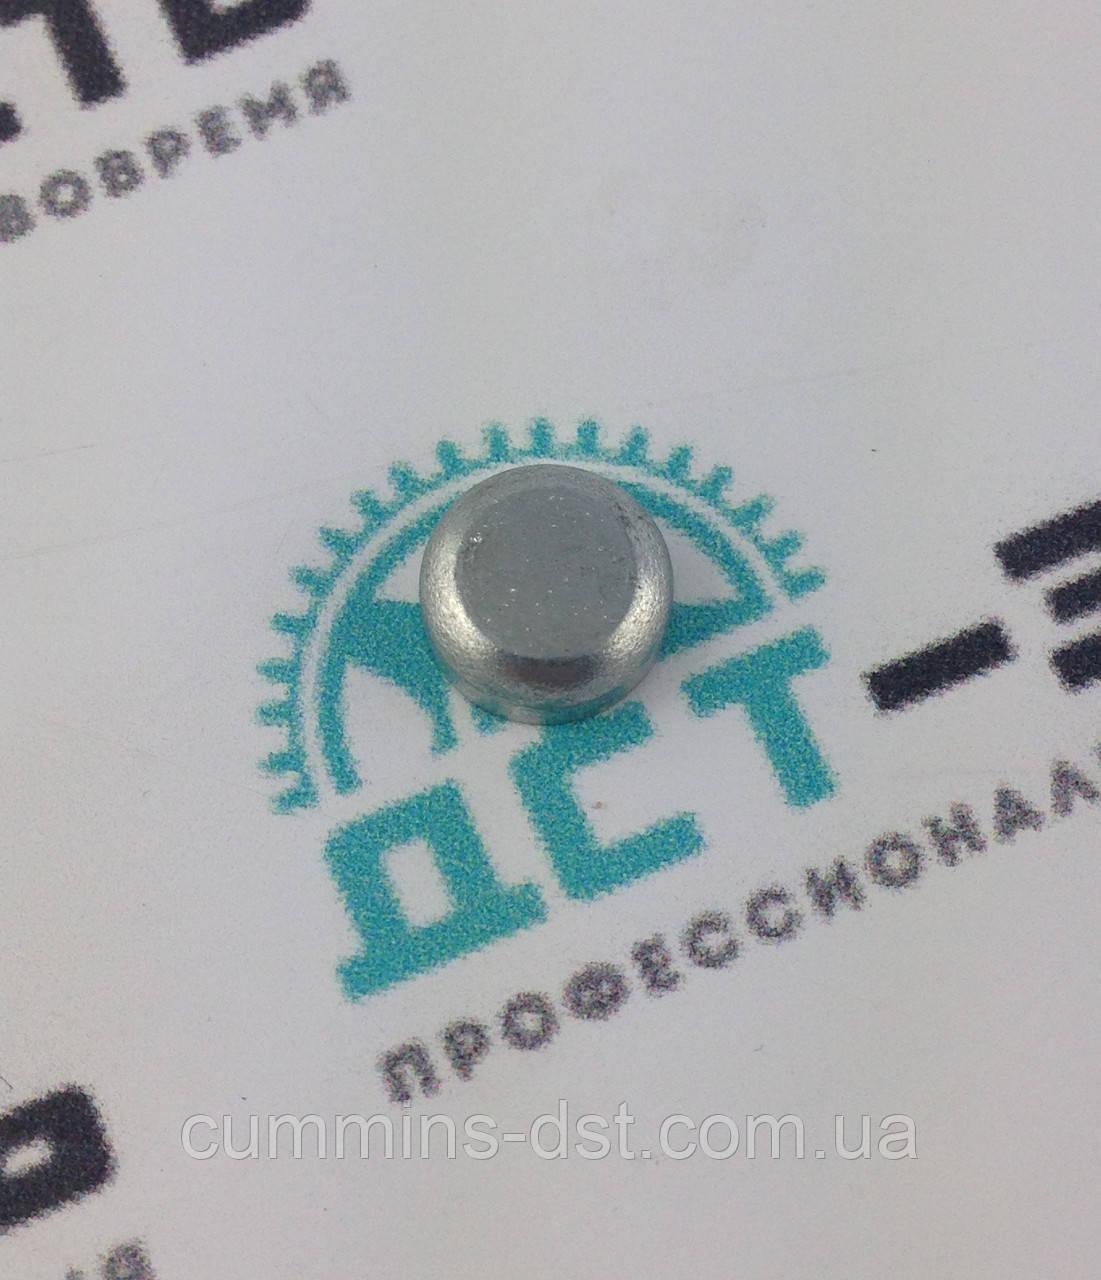 Заглушка для Cummins ISF2.8/4BT/6BT/QSB d=10мм 3900955/3905368